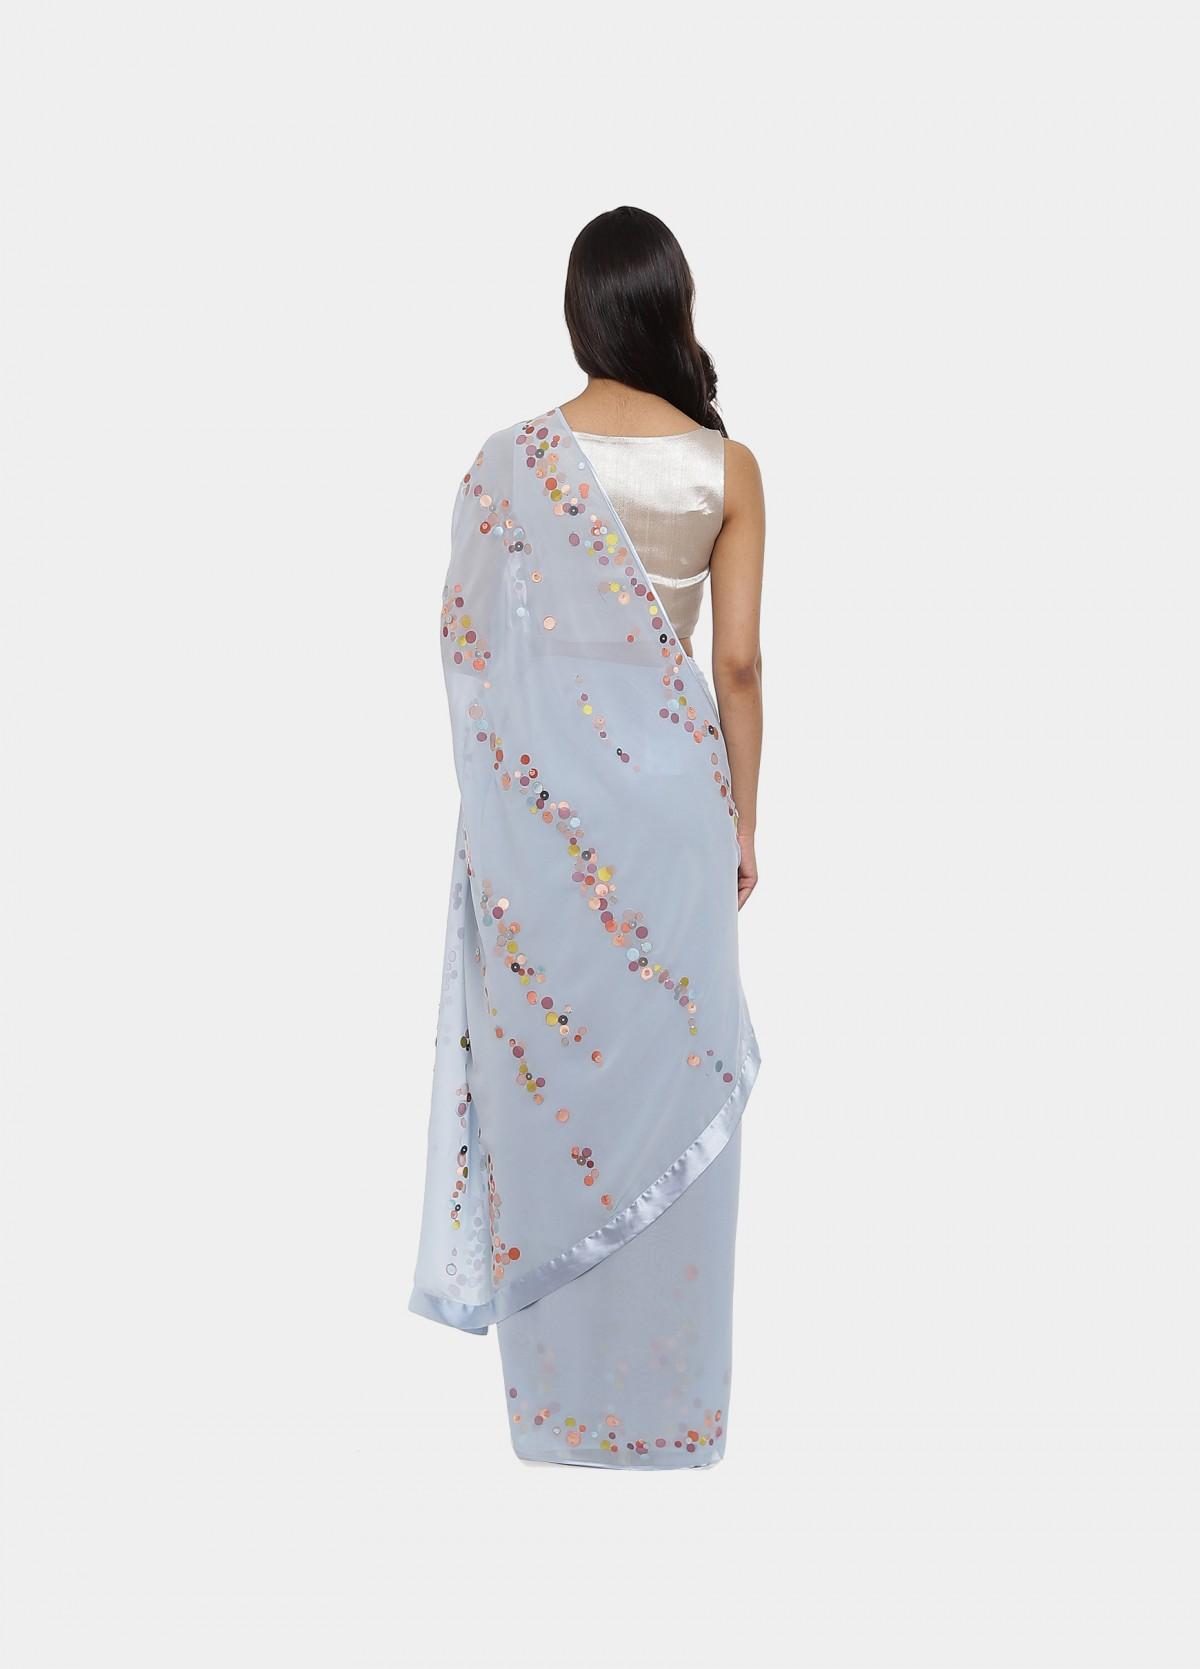 The Iridescent Sari